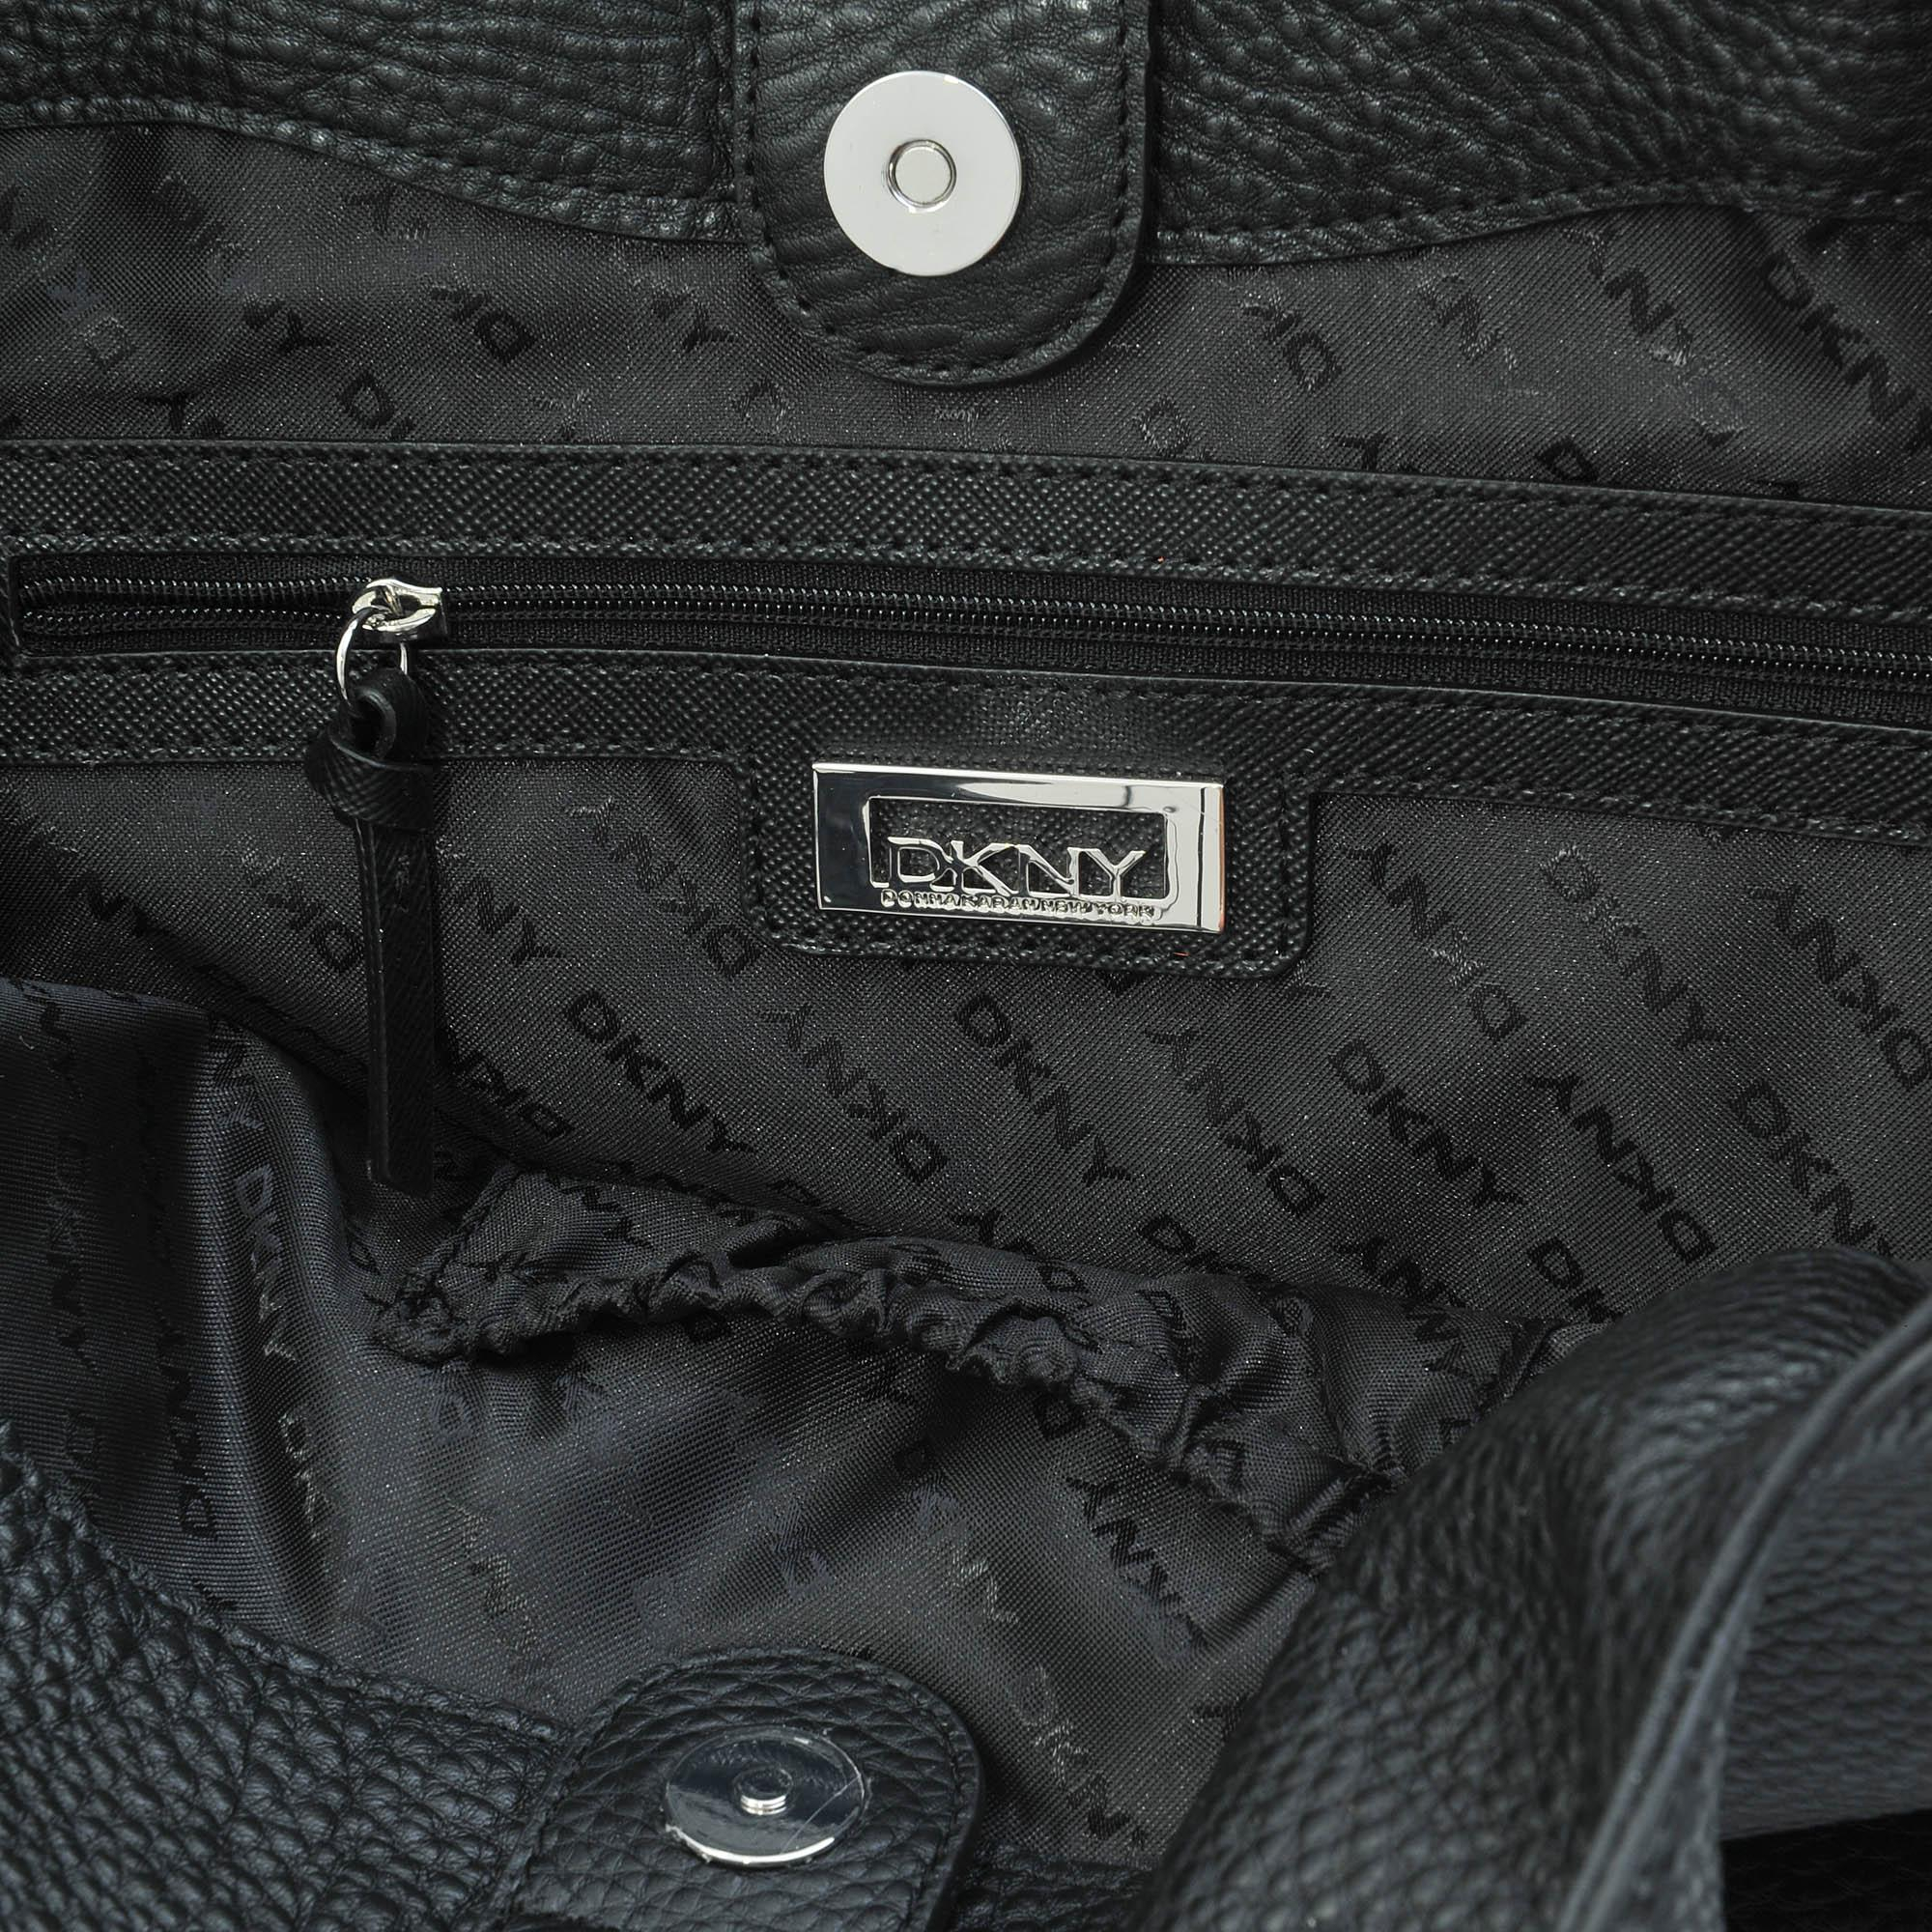 DKNY Ew Zip Tribeca Tote in Black